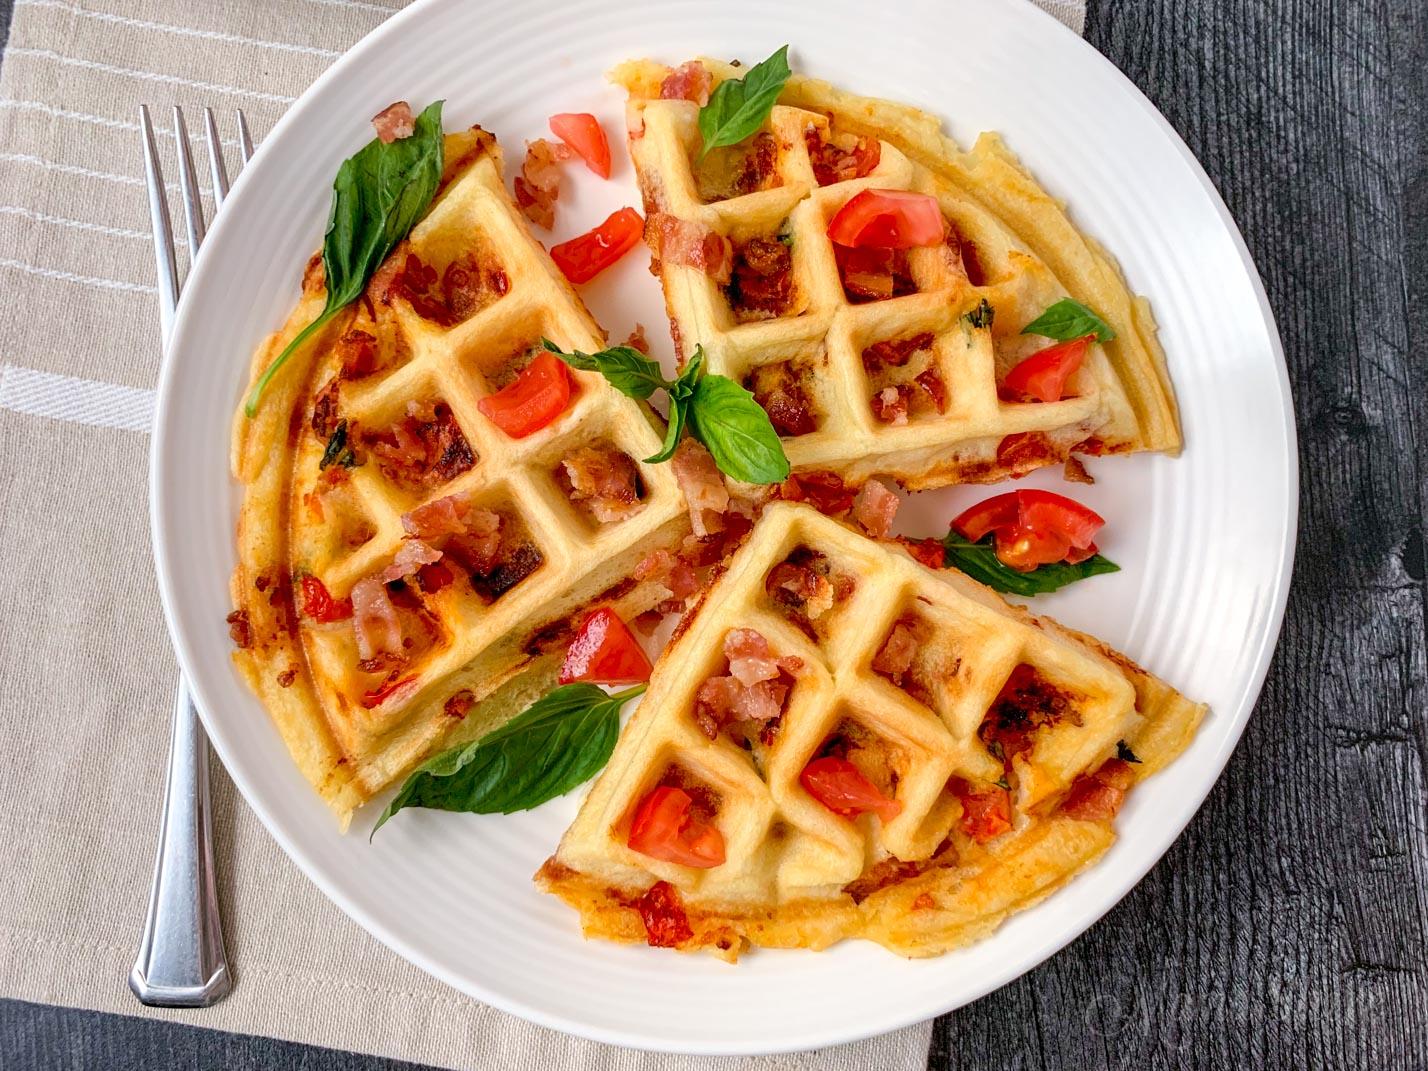 Bacon tomato gluten-free stuffed waffles with basil leaves.